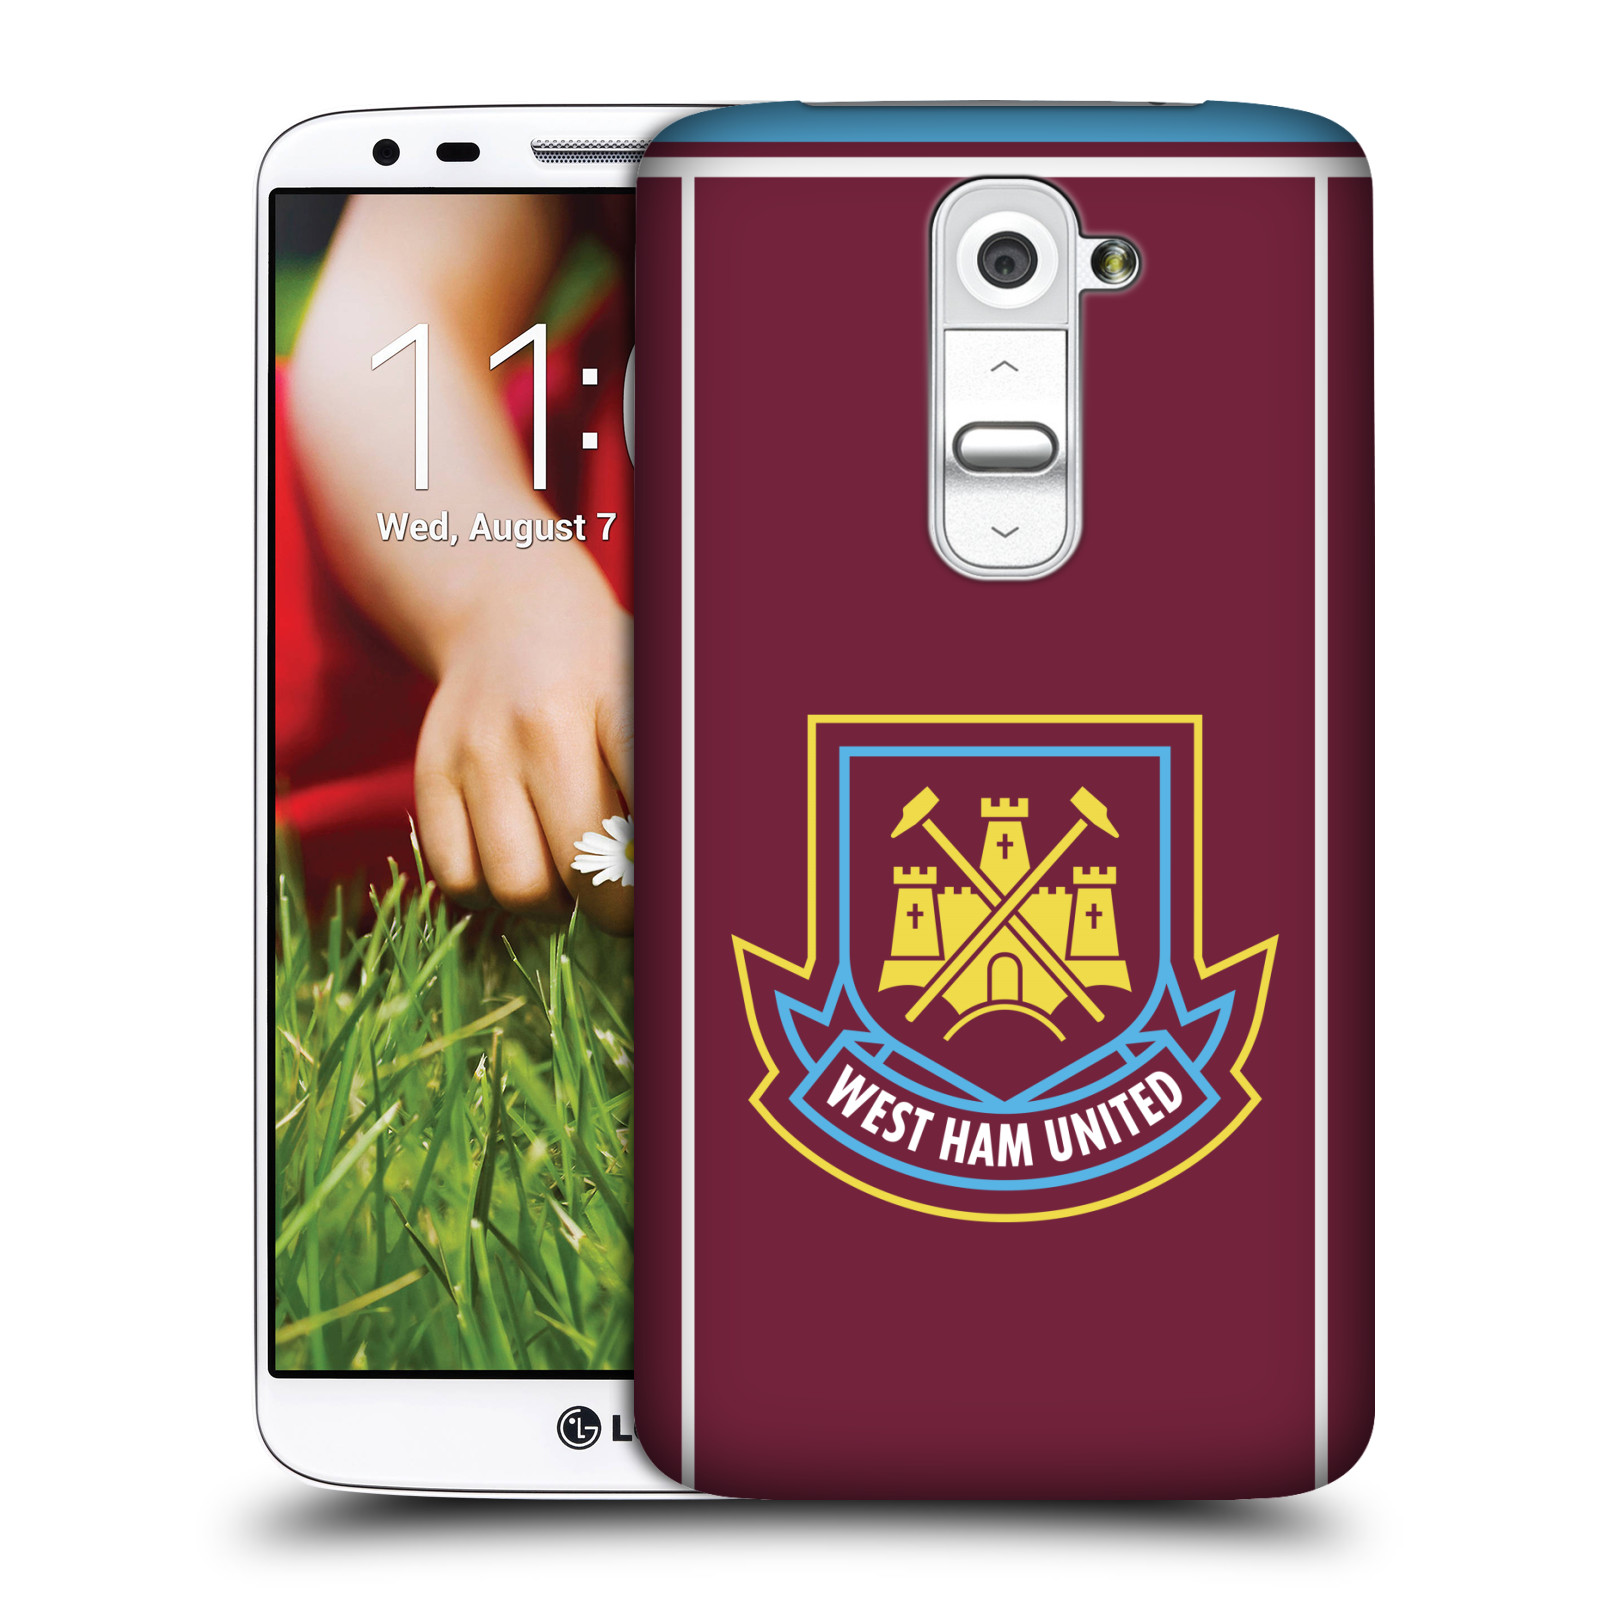 Plastové pouzdro na mobil LG G2 - Head Case - West Ham United - Retro znak